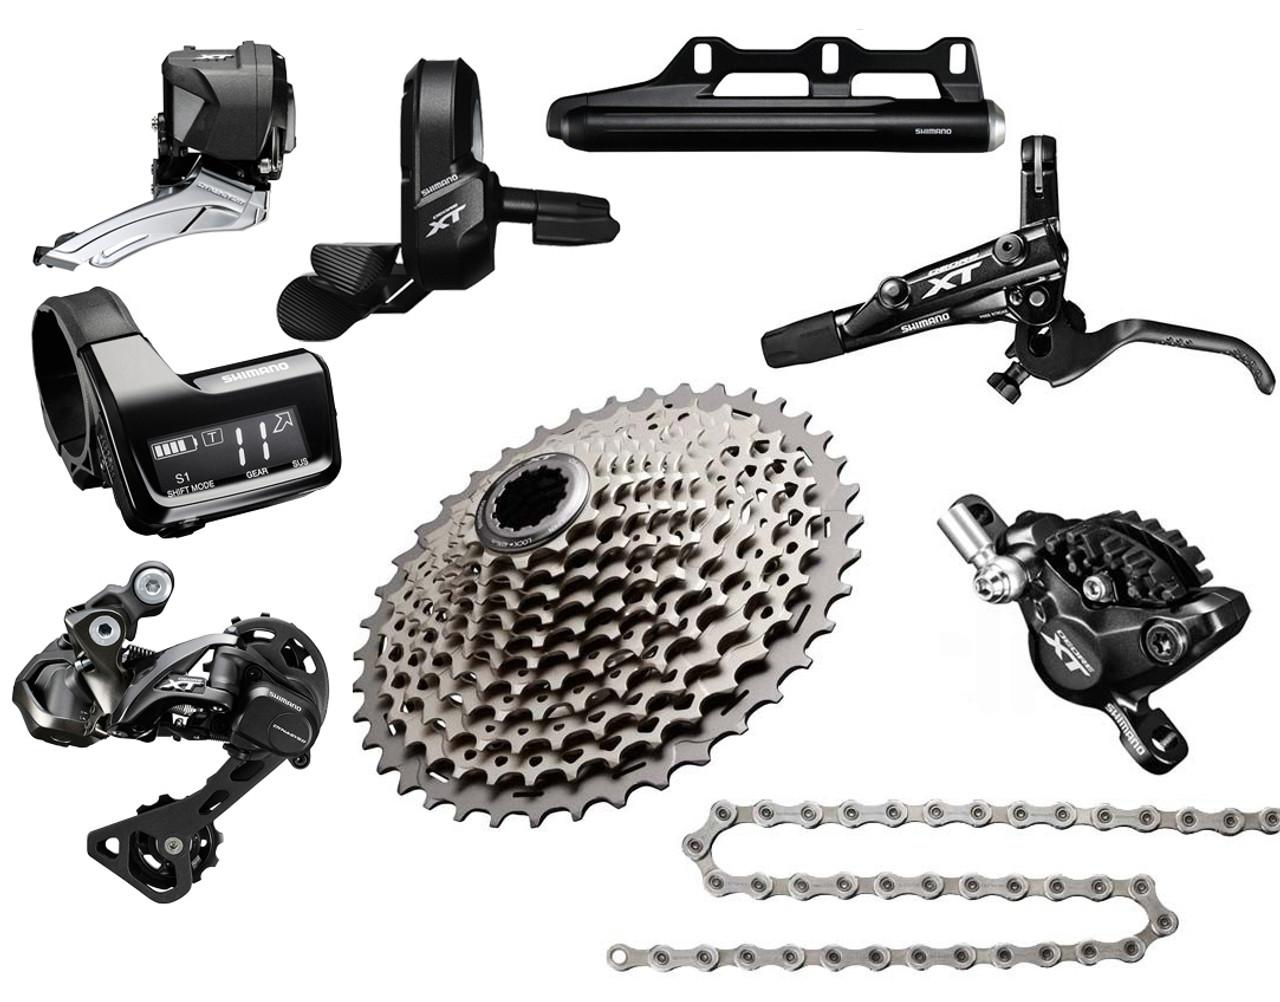 Shimano Xt Di2 Wiring Diagram Diy Diagrams Tt Texas Cyclesport 8050 9 Piece Upgrade Kit 9u Rh Texascyclesport Com Ultegra 6770 Group